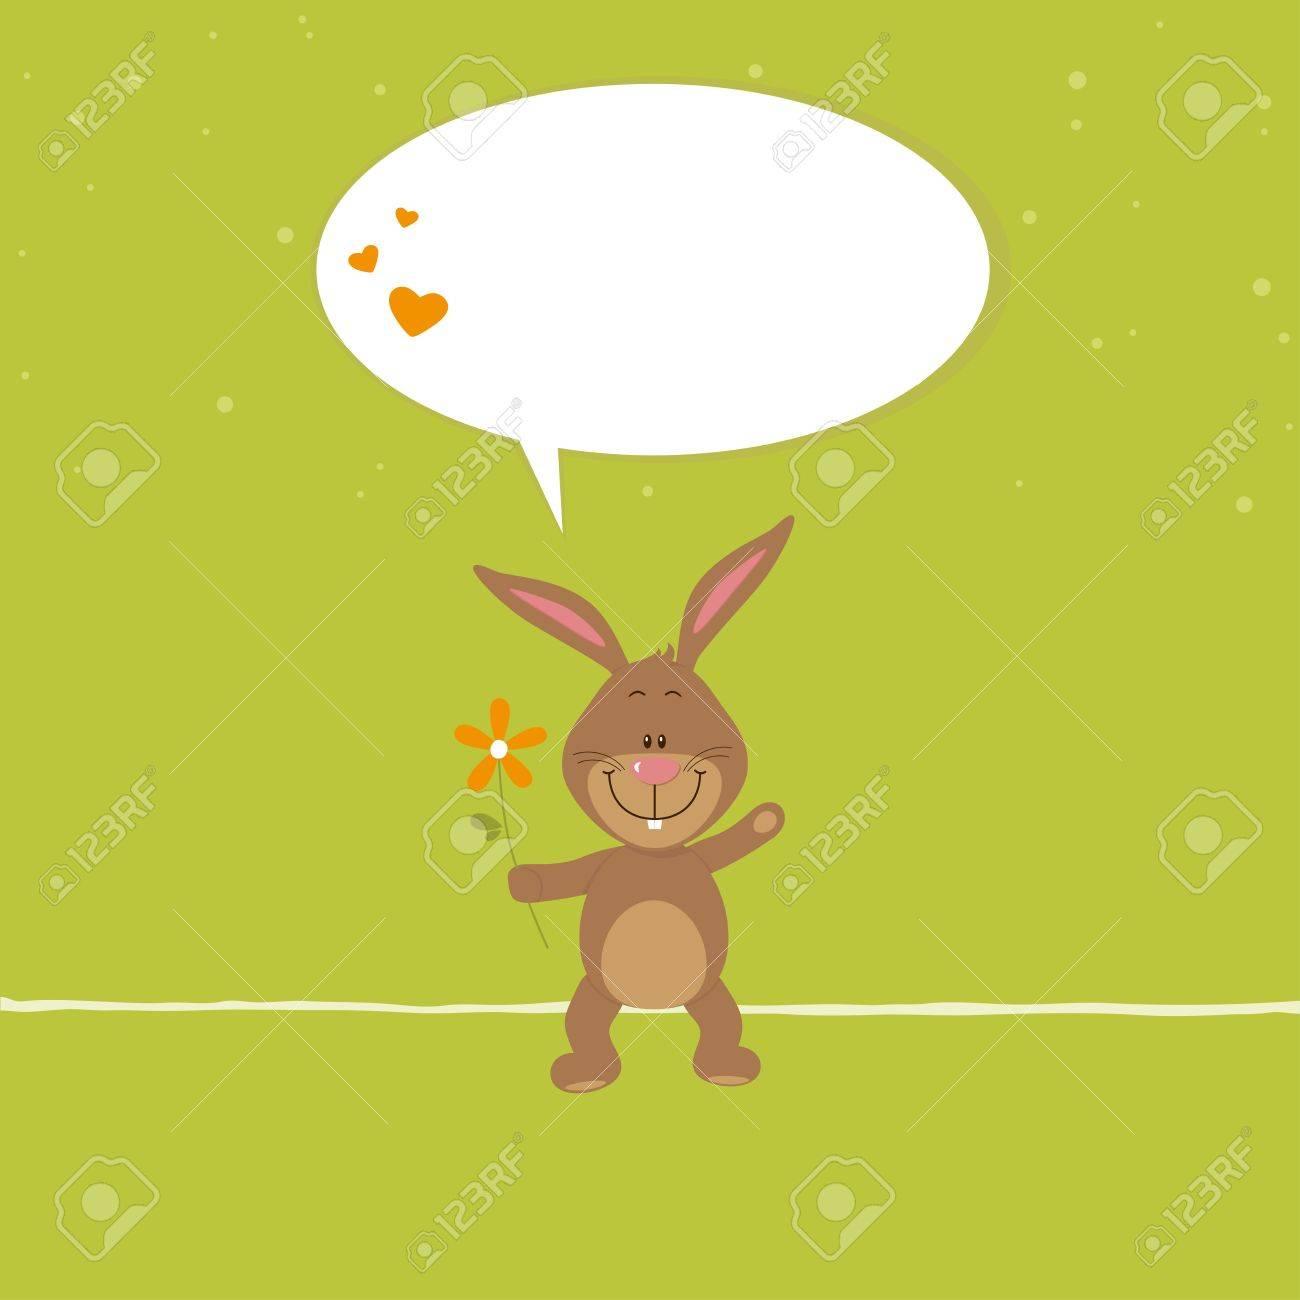 Lovely bunny with orange flower Stock Vector - 17993667